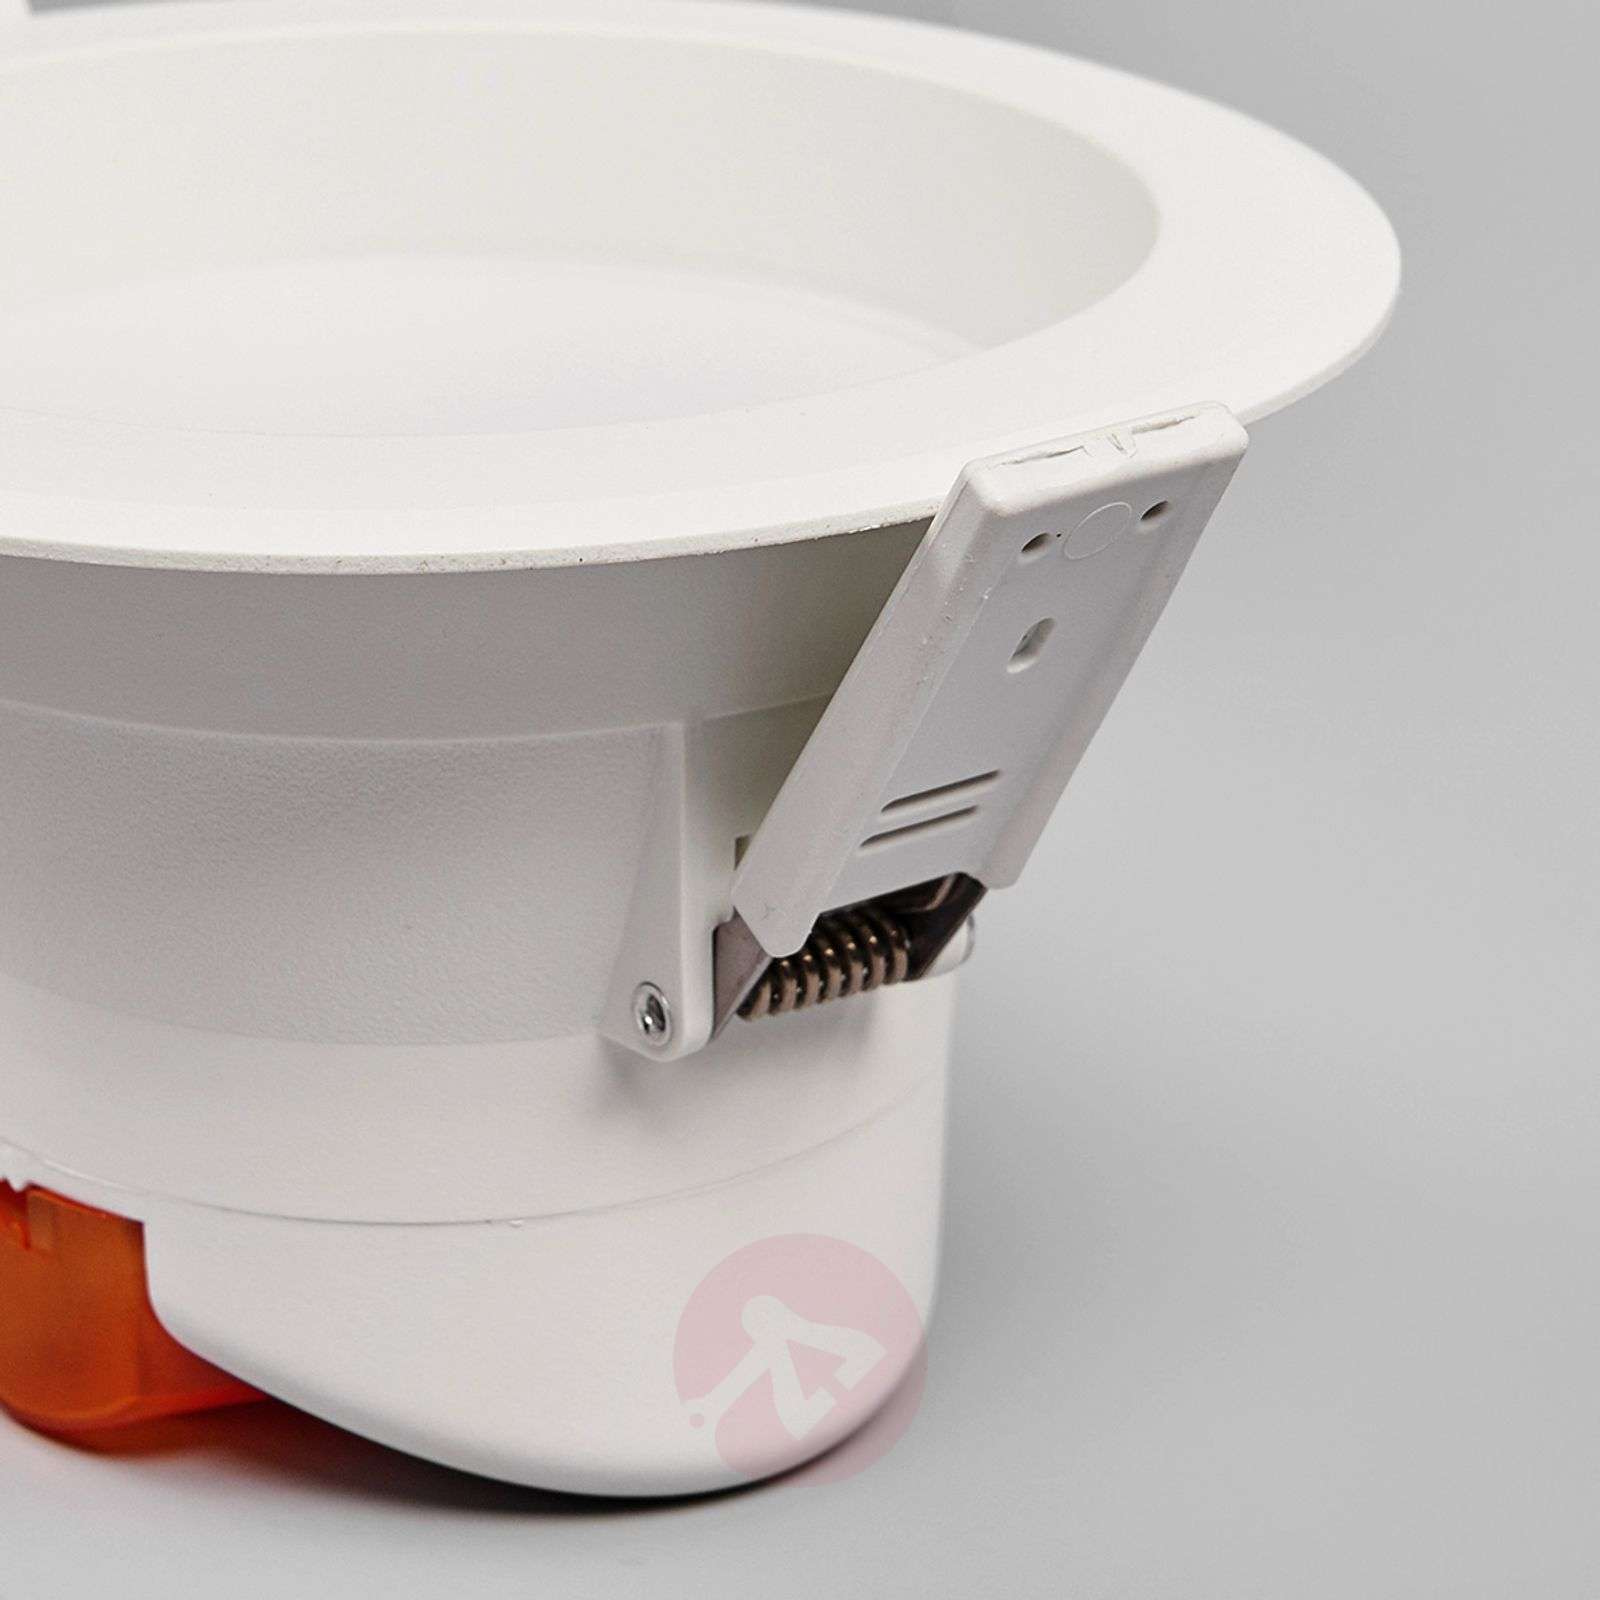 LED recessed spotlight Arian in white, 11.3 cm, 9W-9978009-03